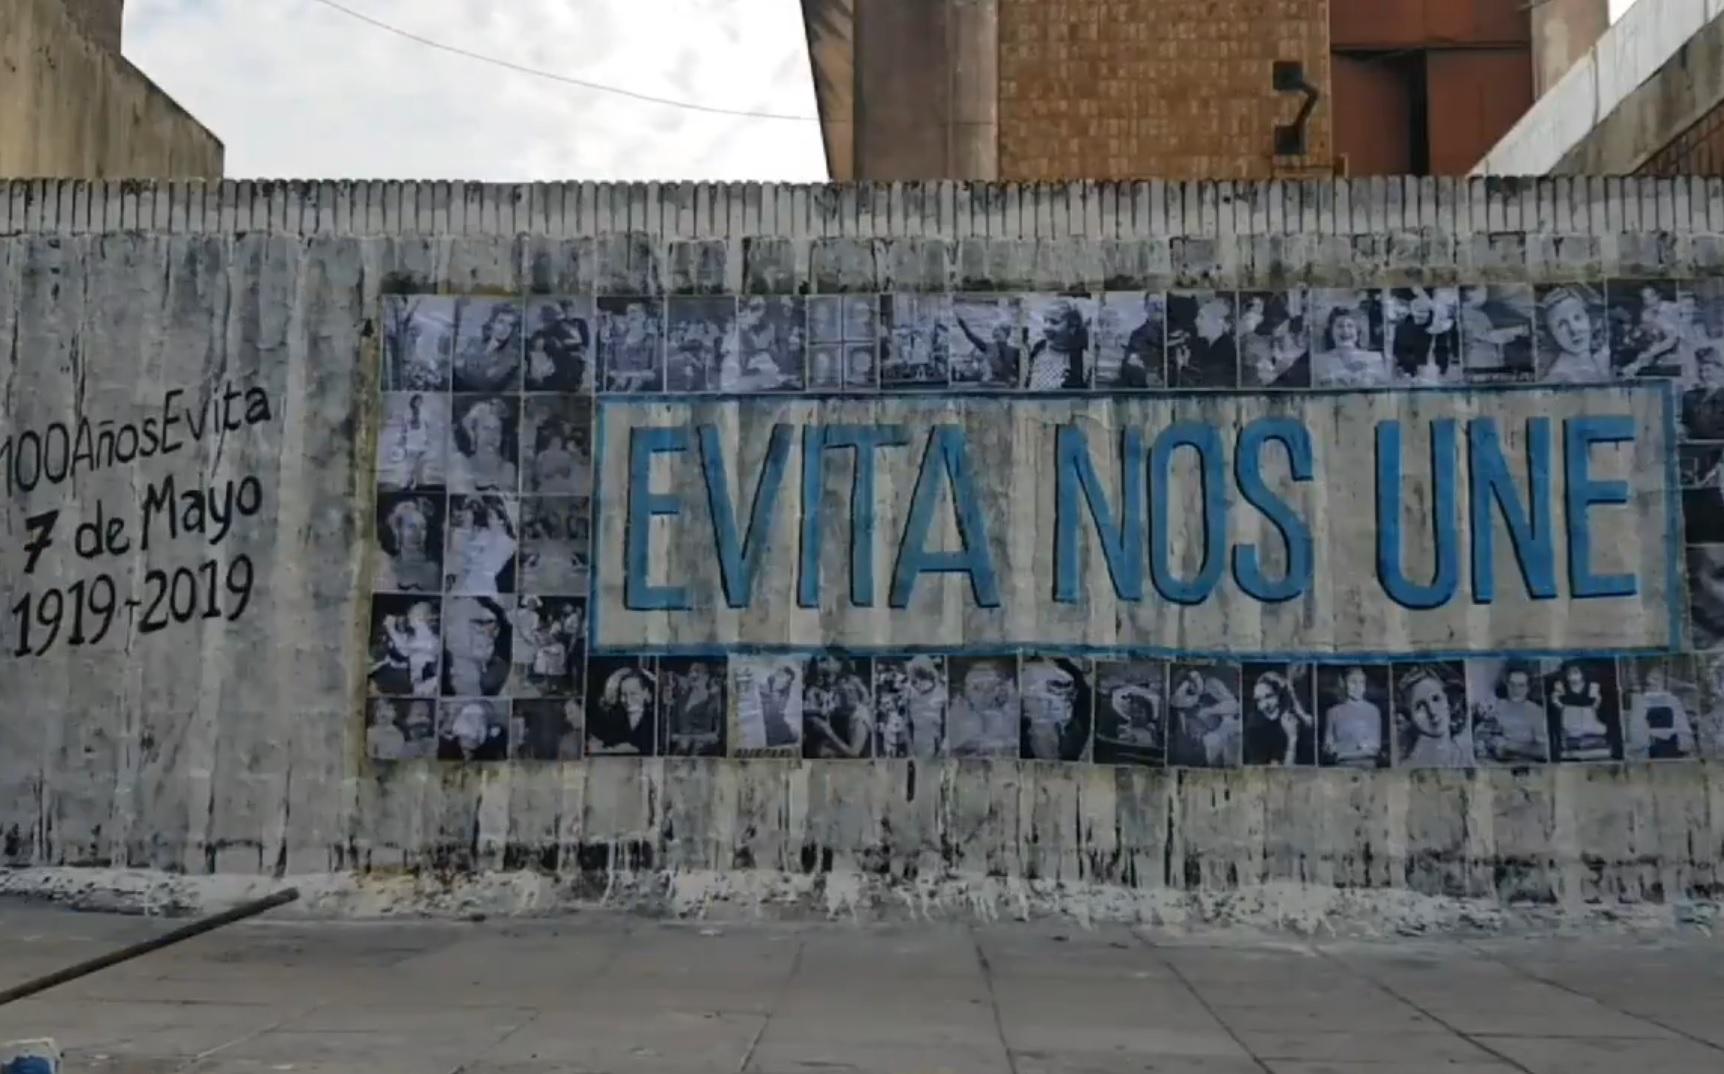 http://periodistadeperon.com/wp-content/uploads/2019/05/mural-evita-olivos.jpg